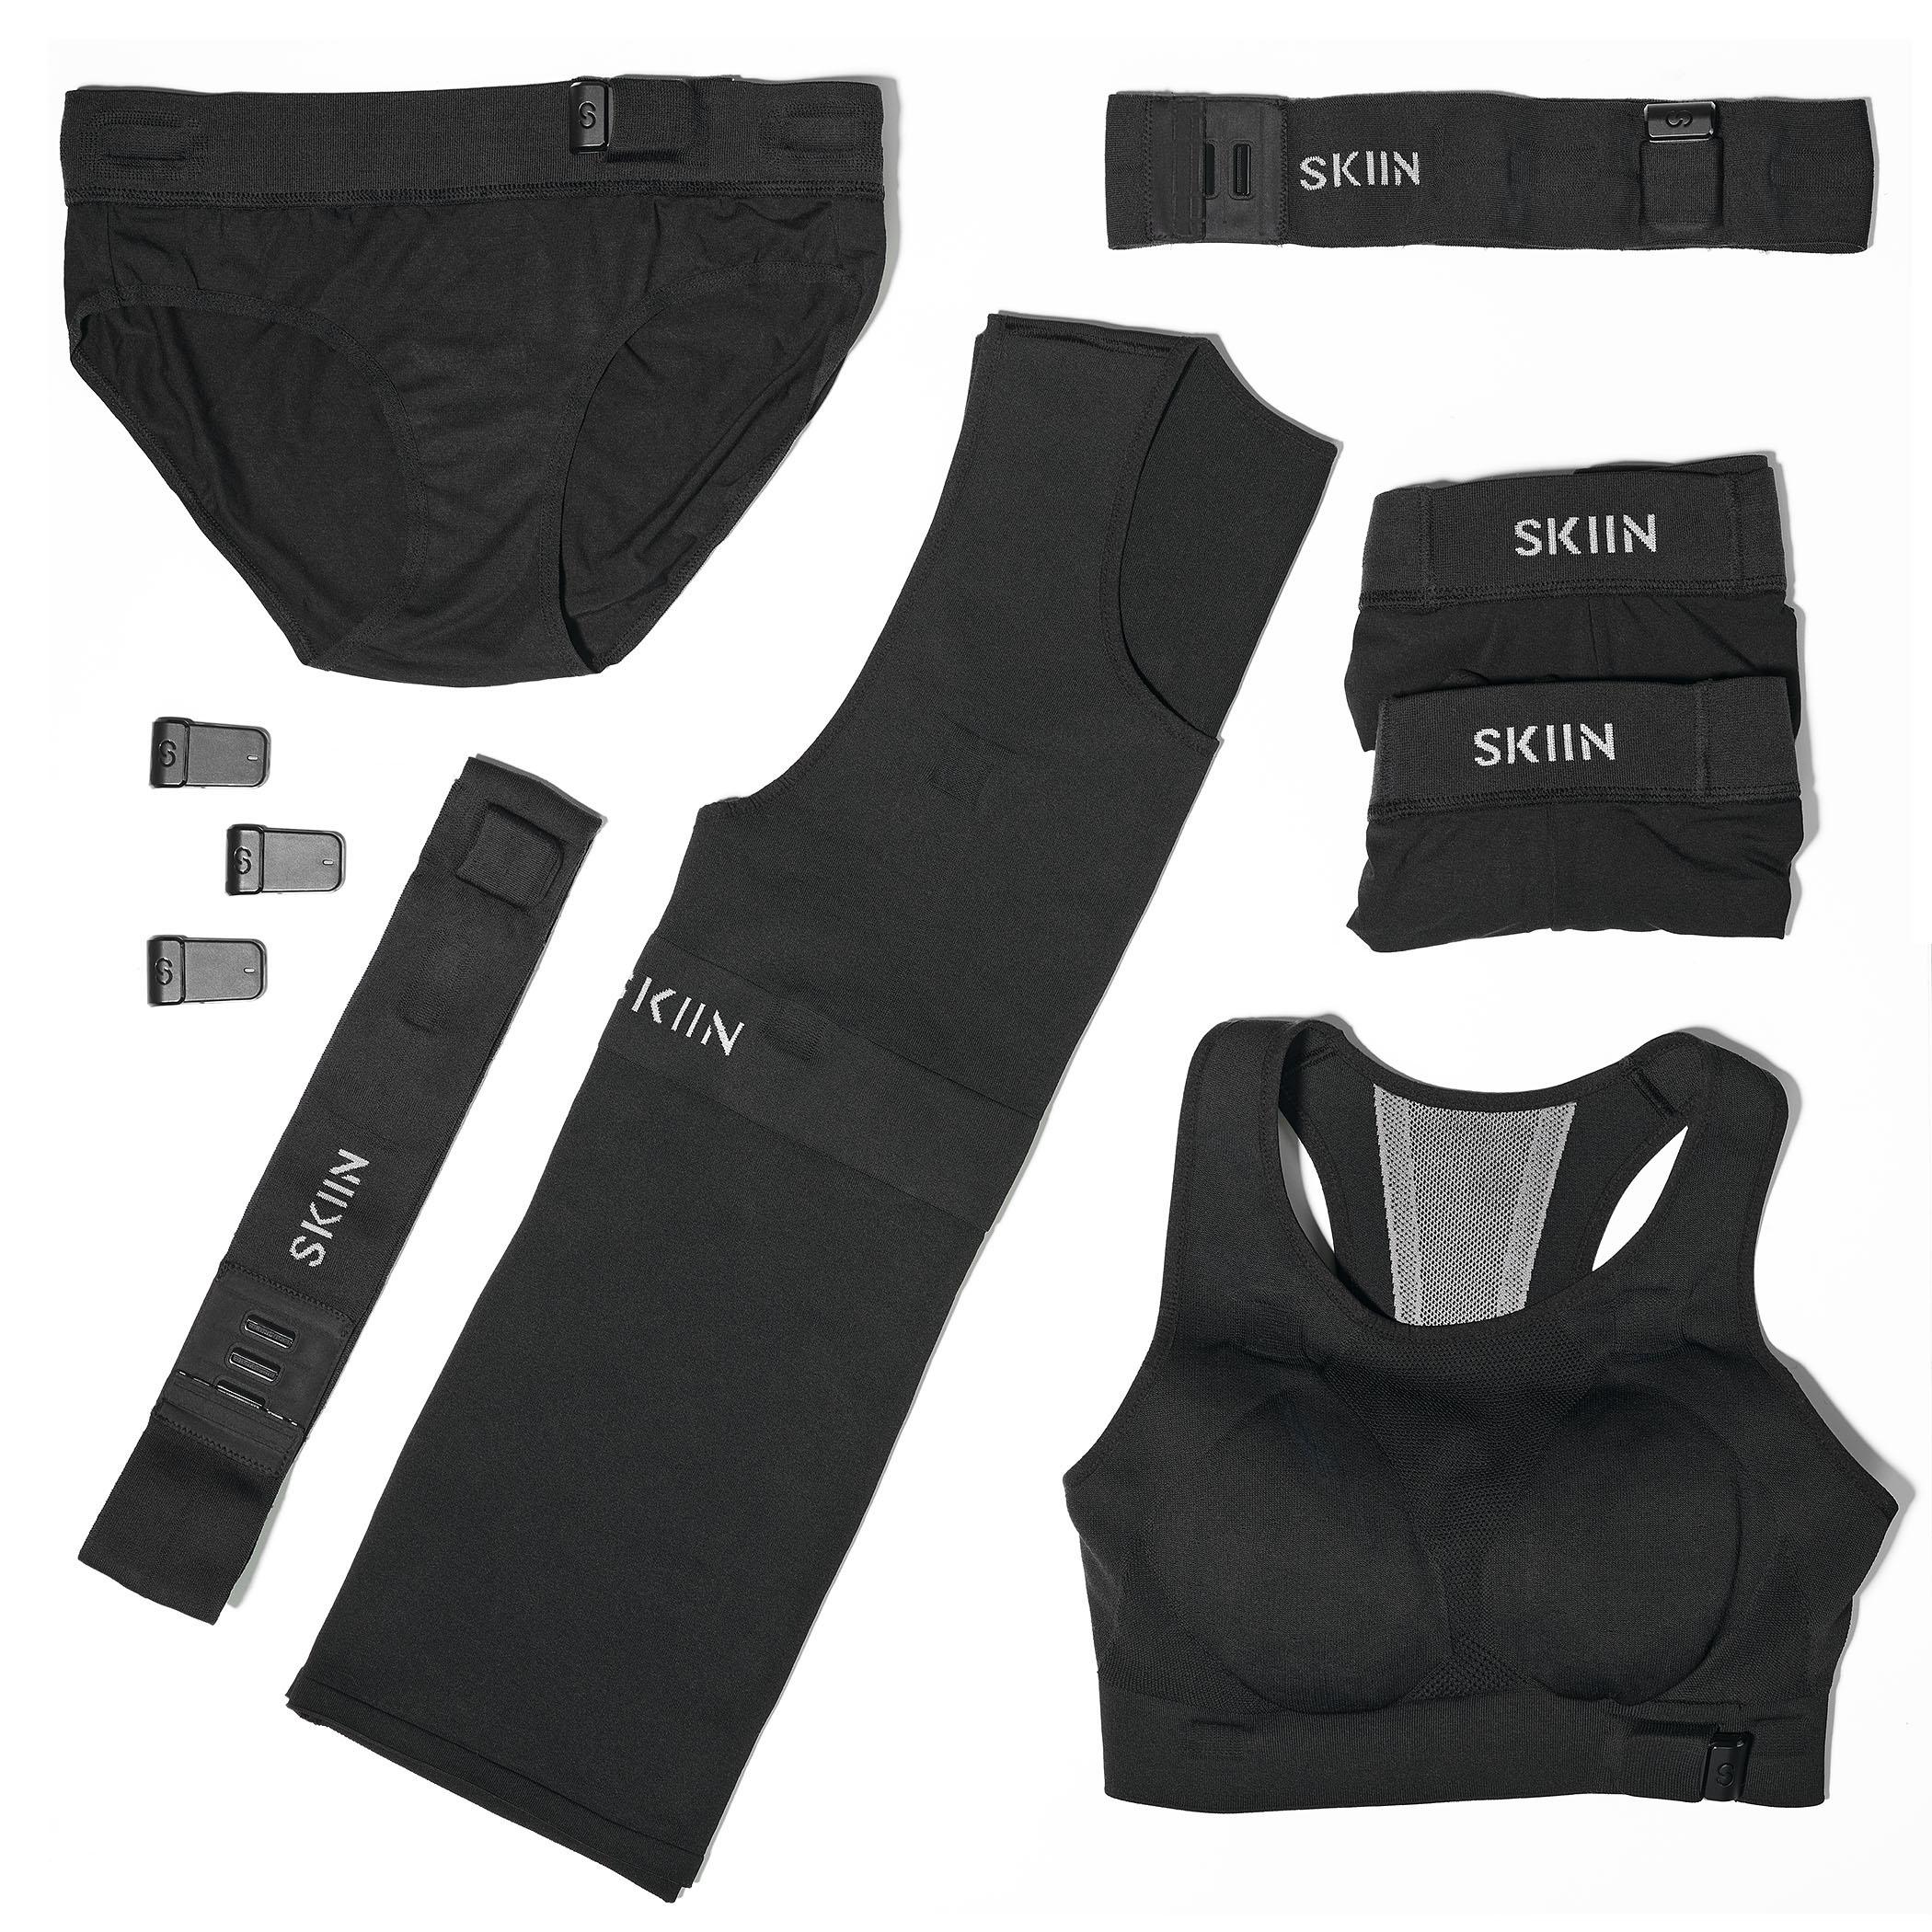 SKIIN smart garments